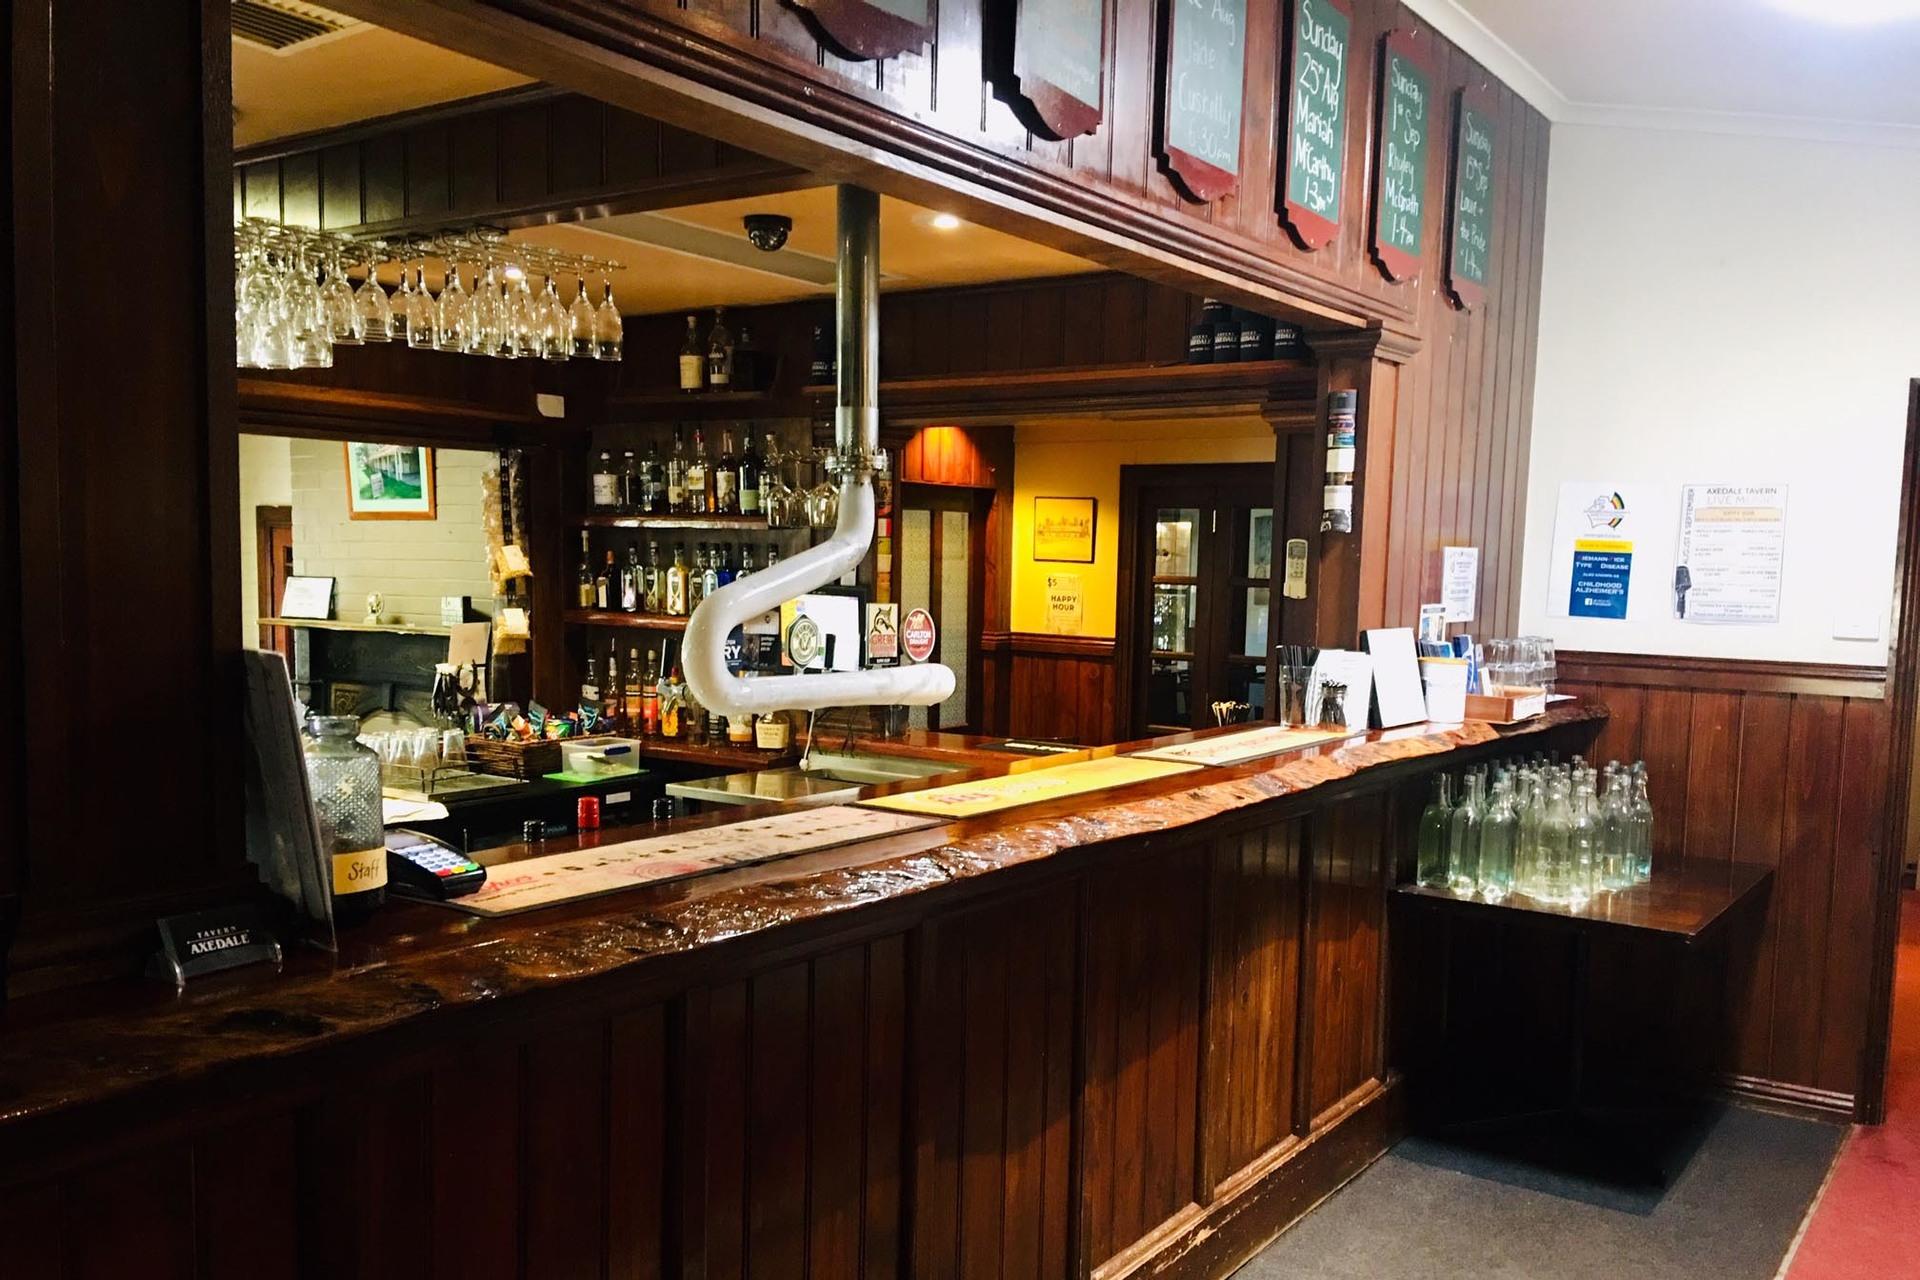 g - Axedale Tavern